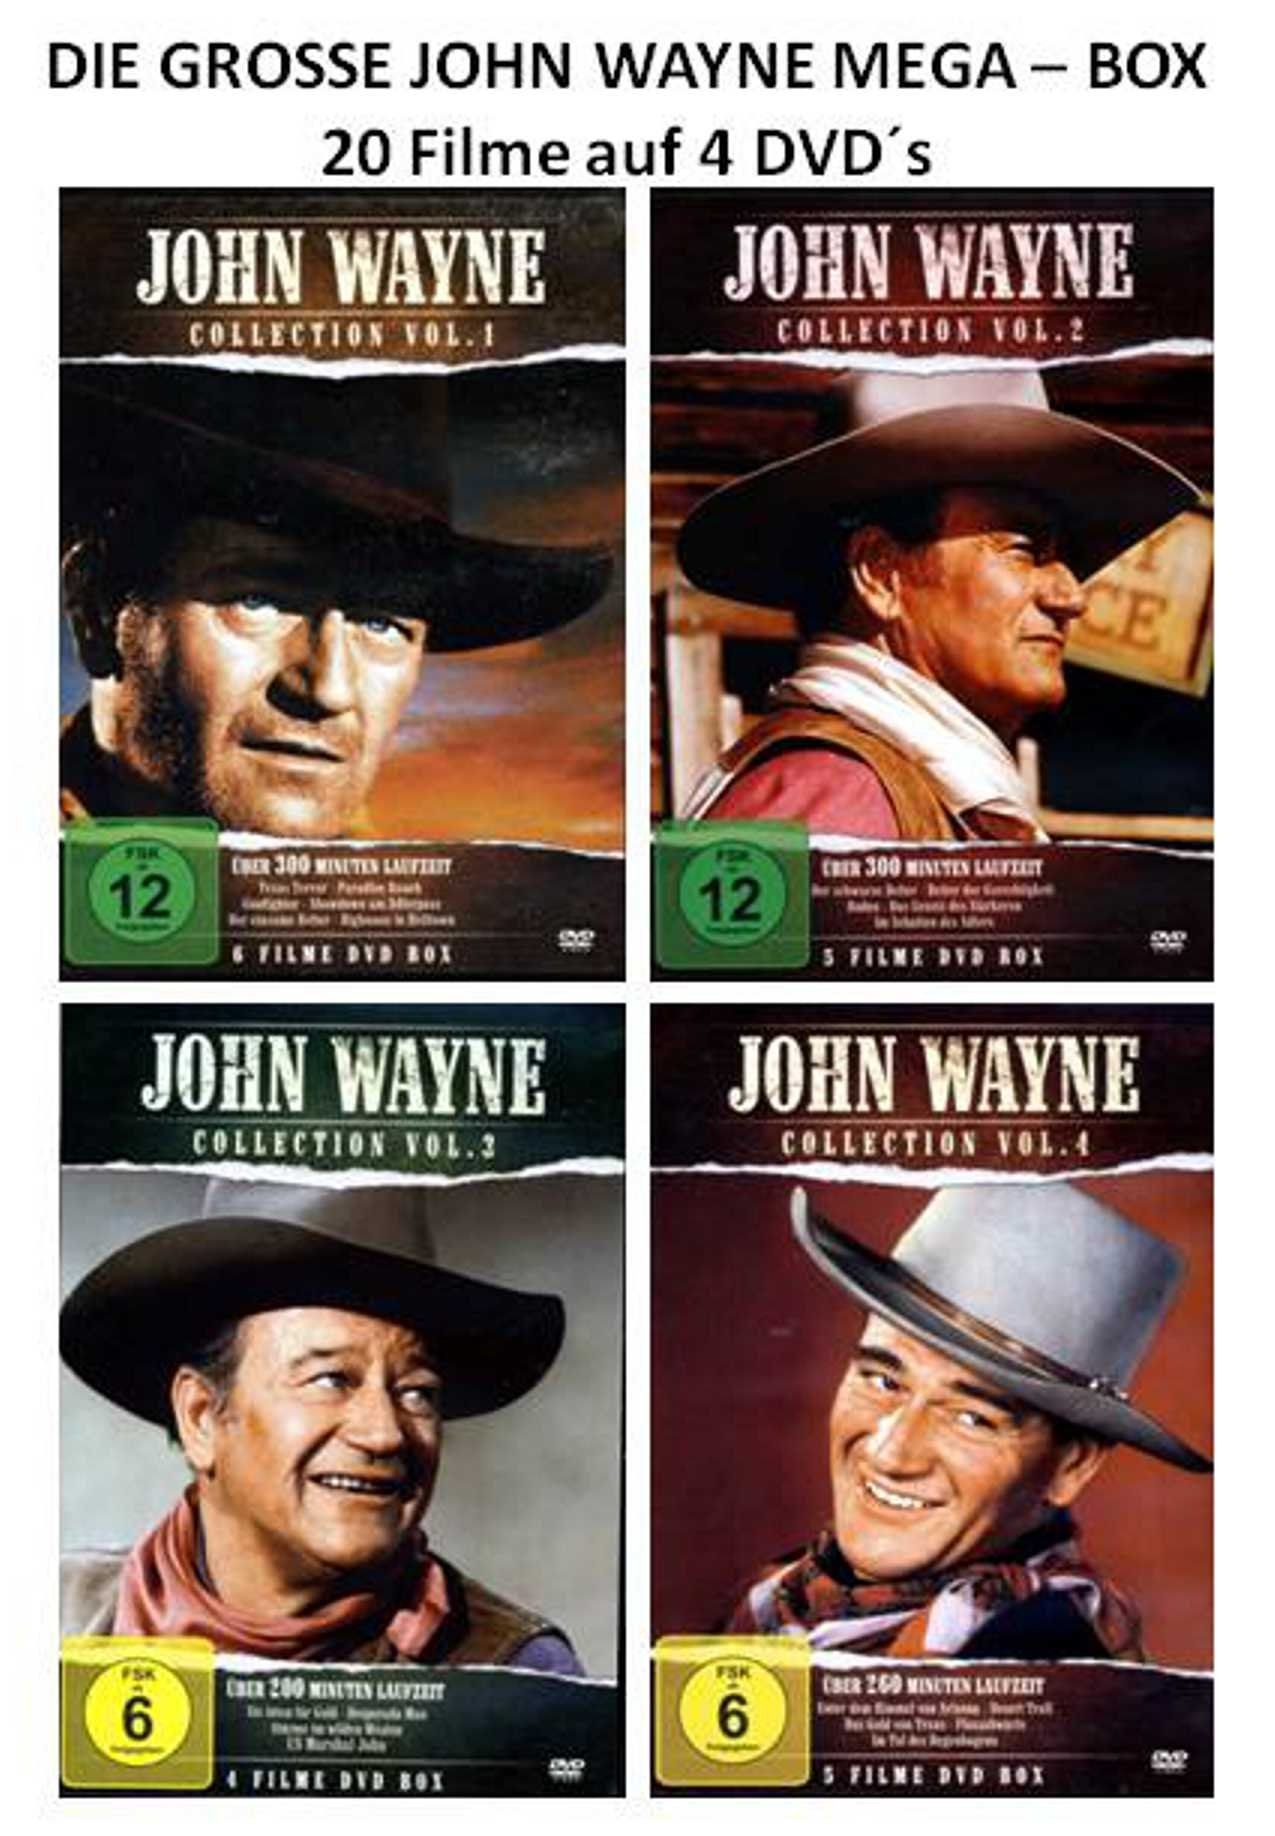 Die große John Wayne Mega-Box ( 20 Filme auf 4 DVDs )